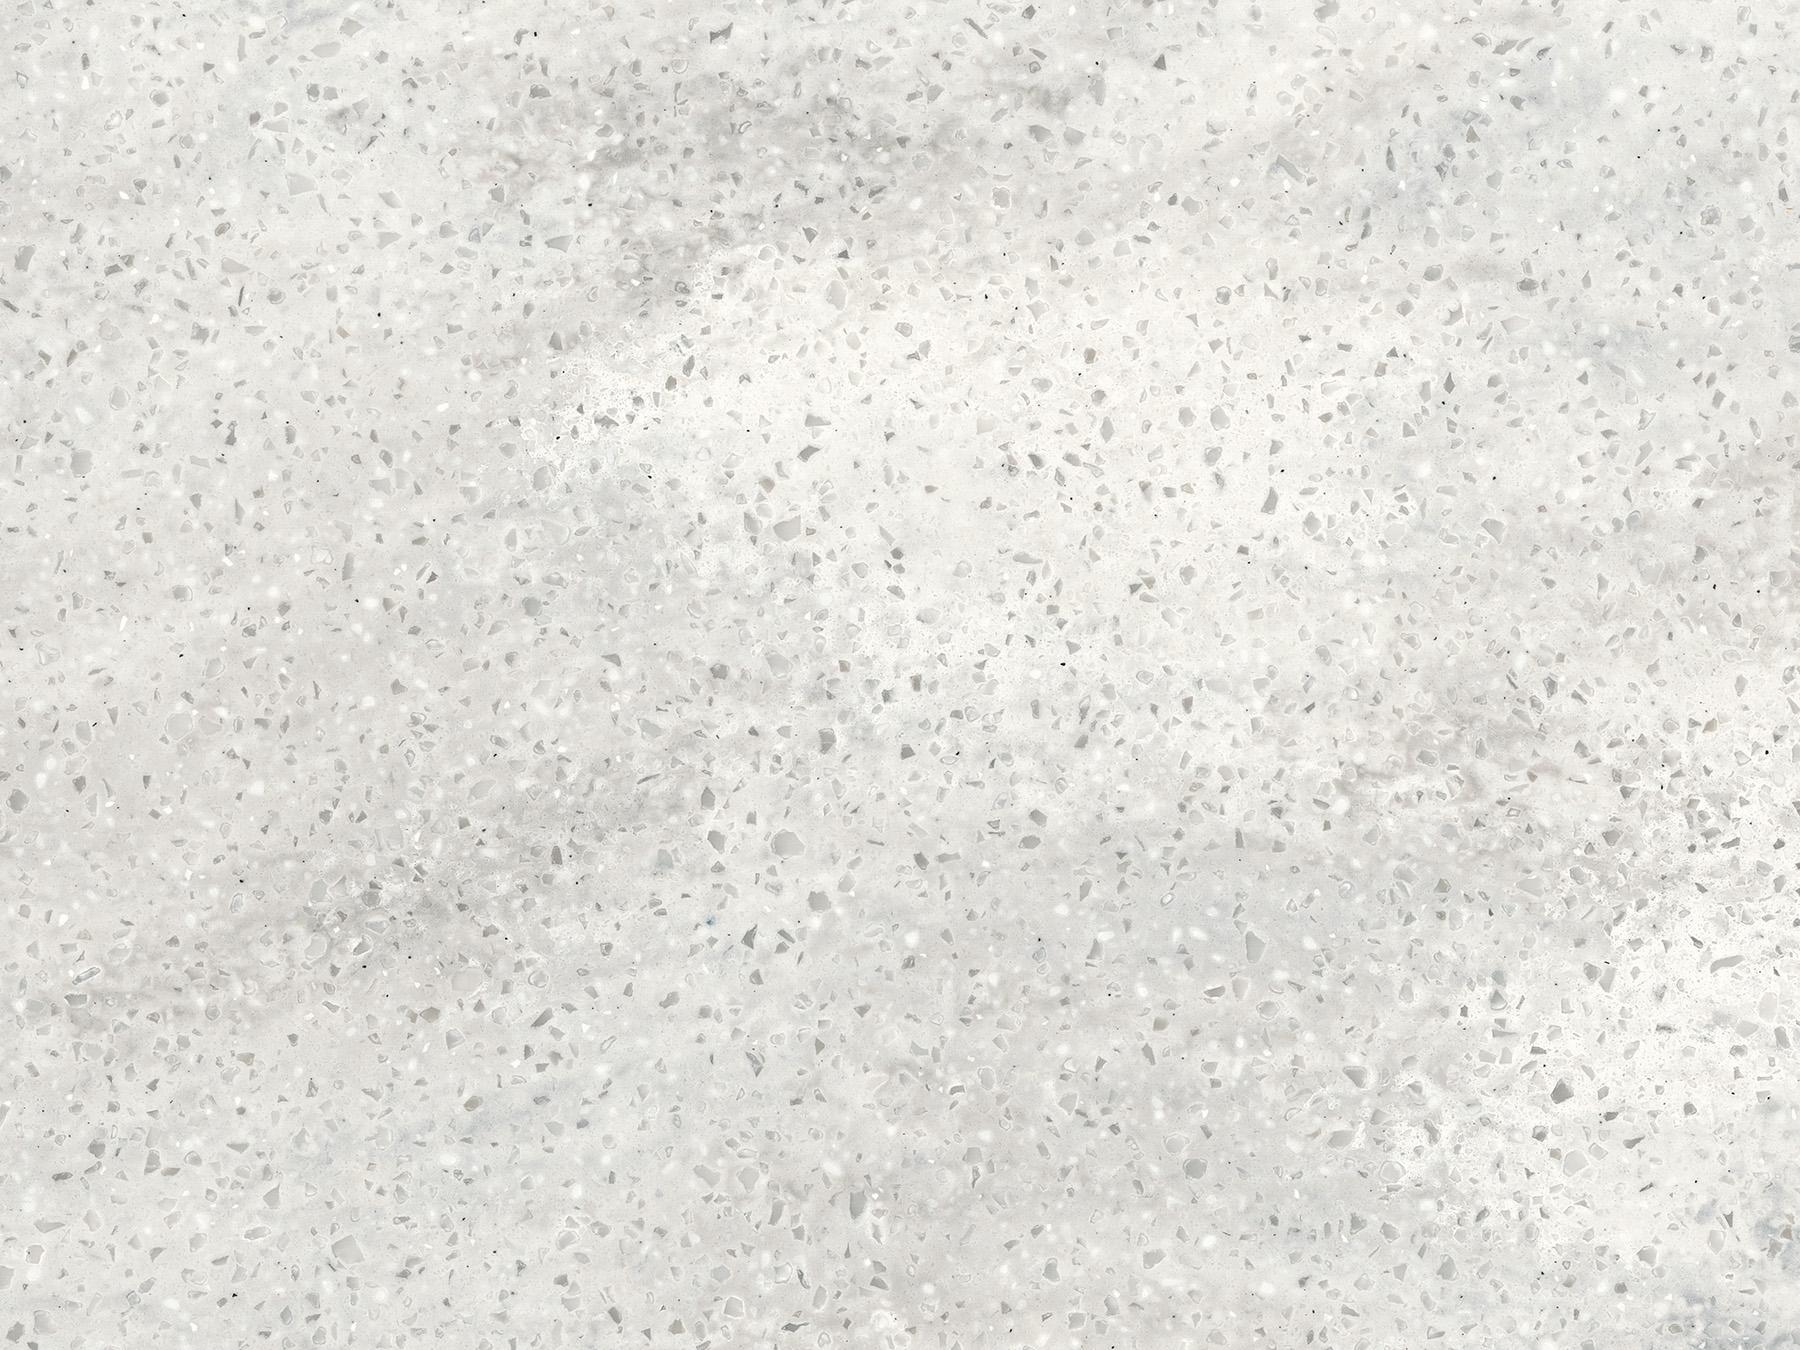 Maine Countertops Dupont Corian Solid Surfaces By Bangor Wholesale Laminates,Greek Club Sandwich